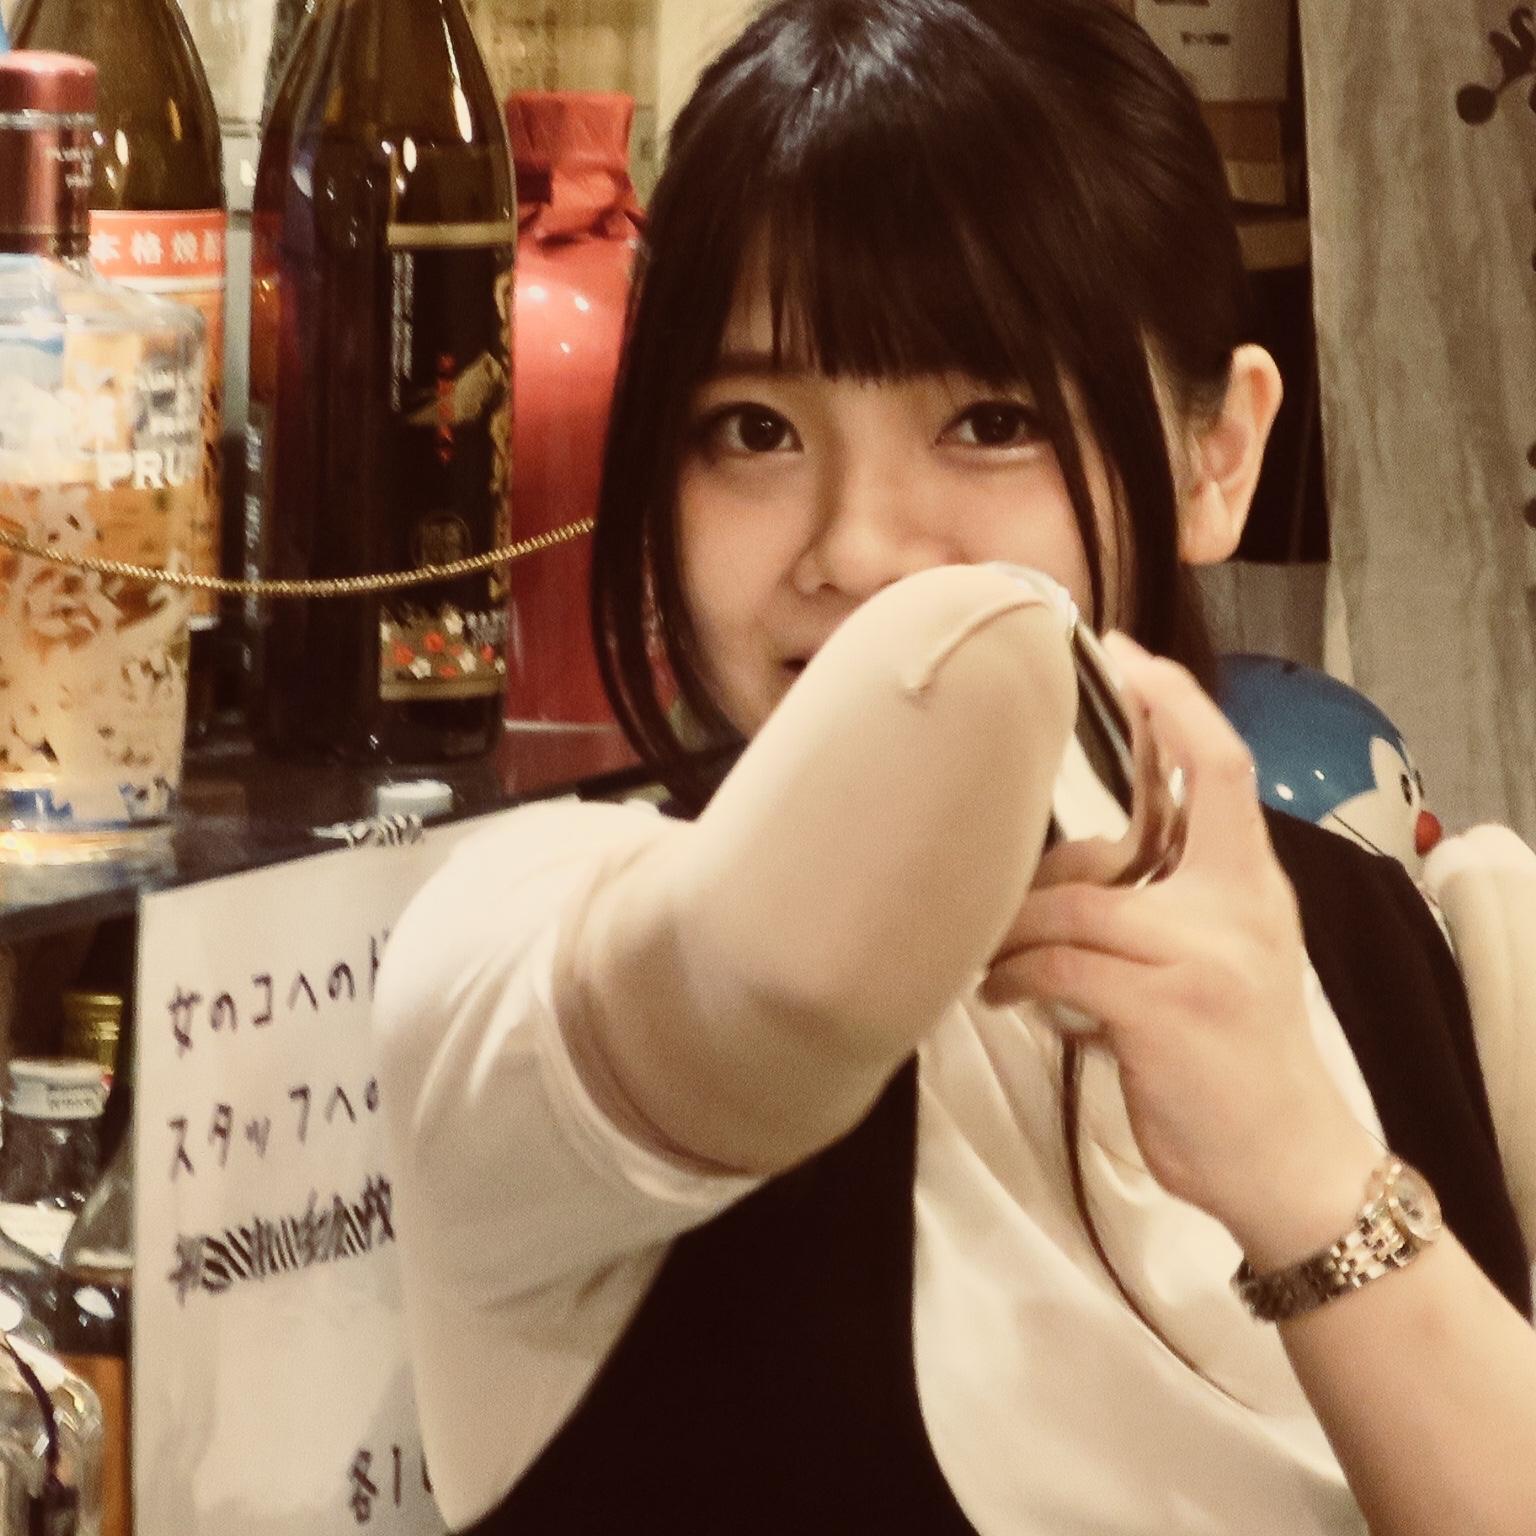 『Bar 琴音 2018.01』@新宿ゴールデン街からーず。会員先行予約